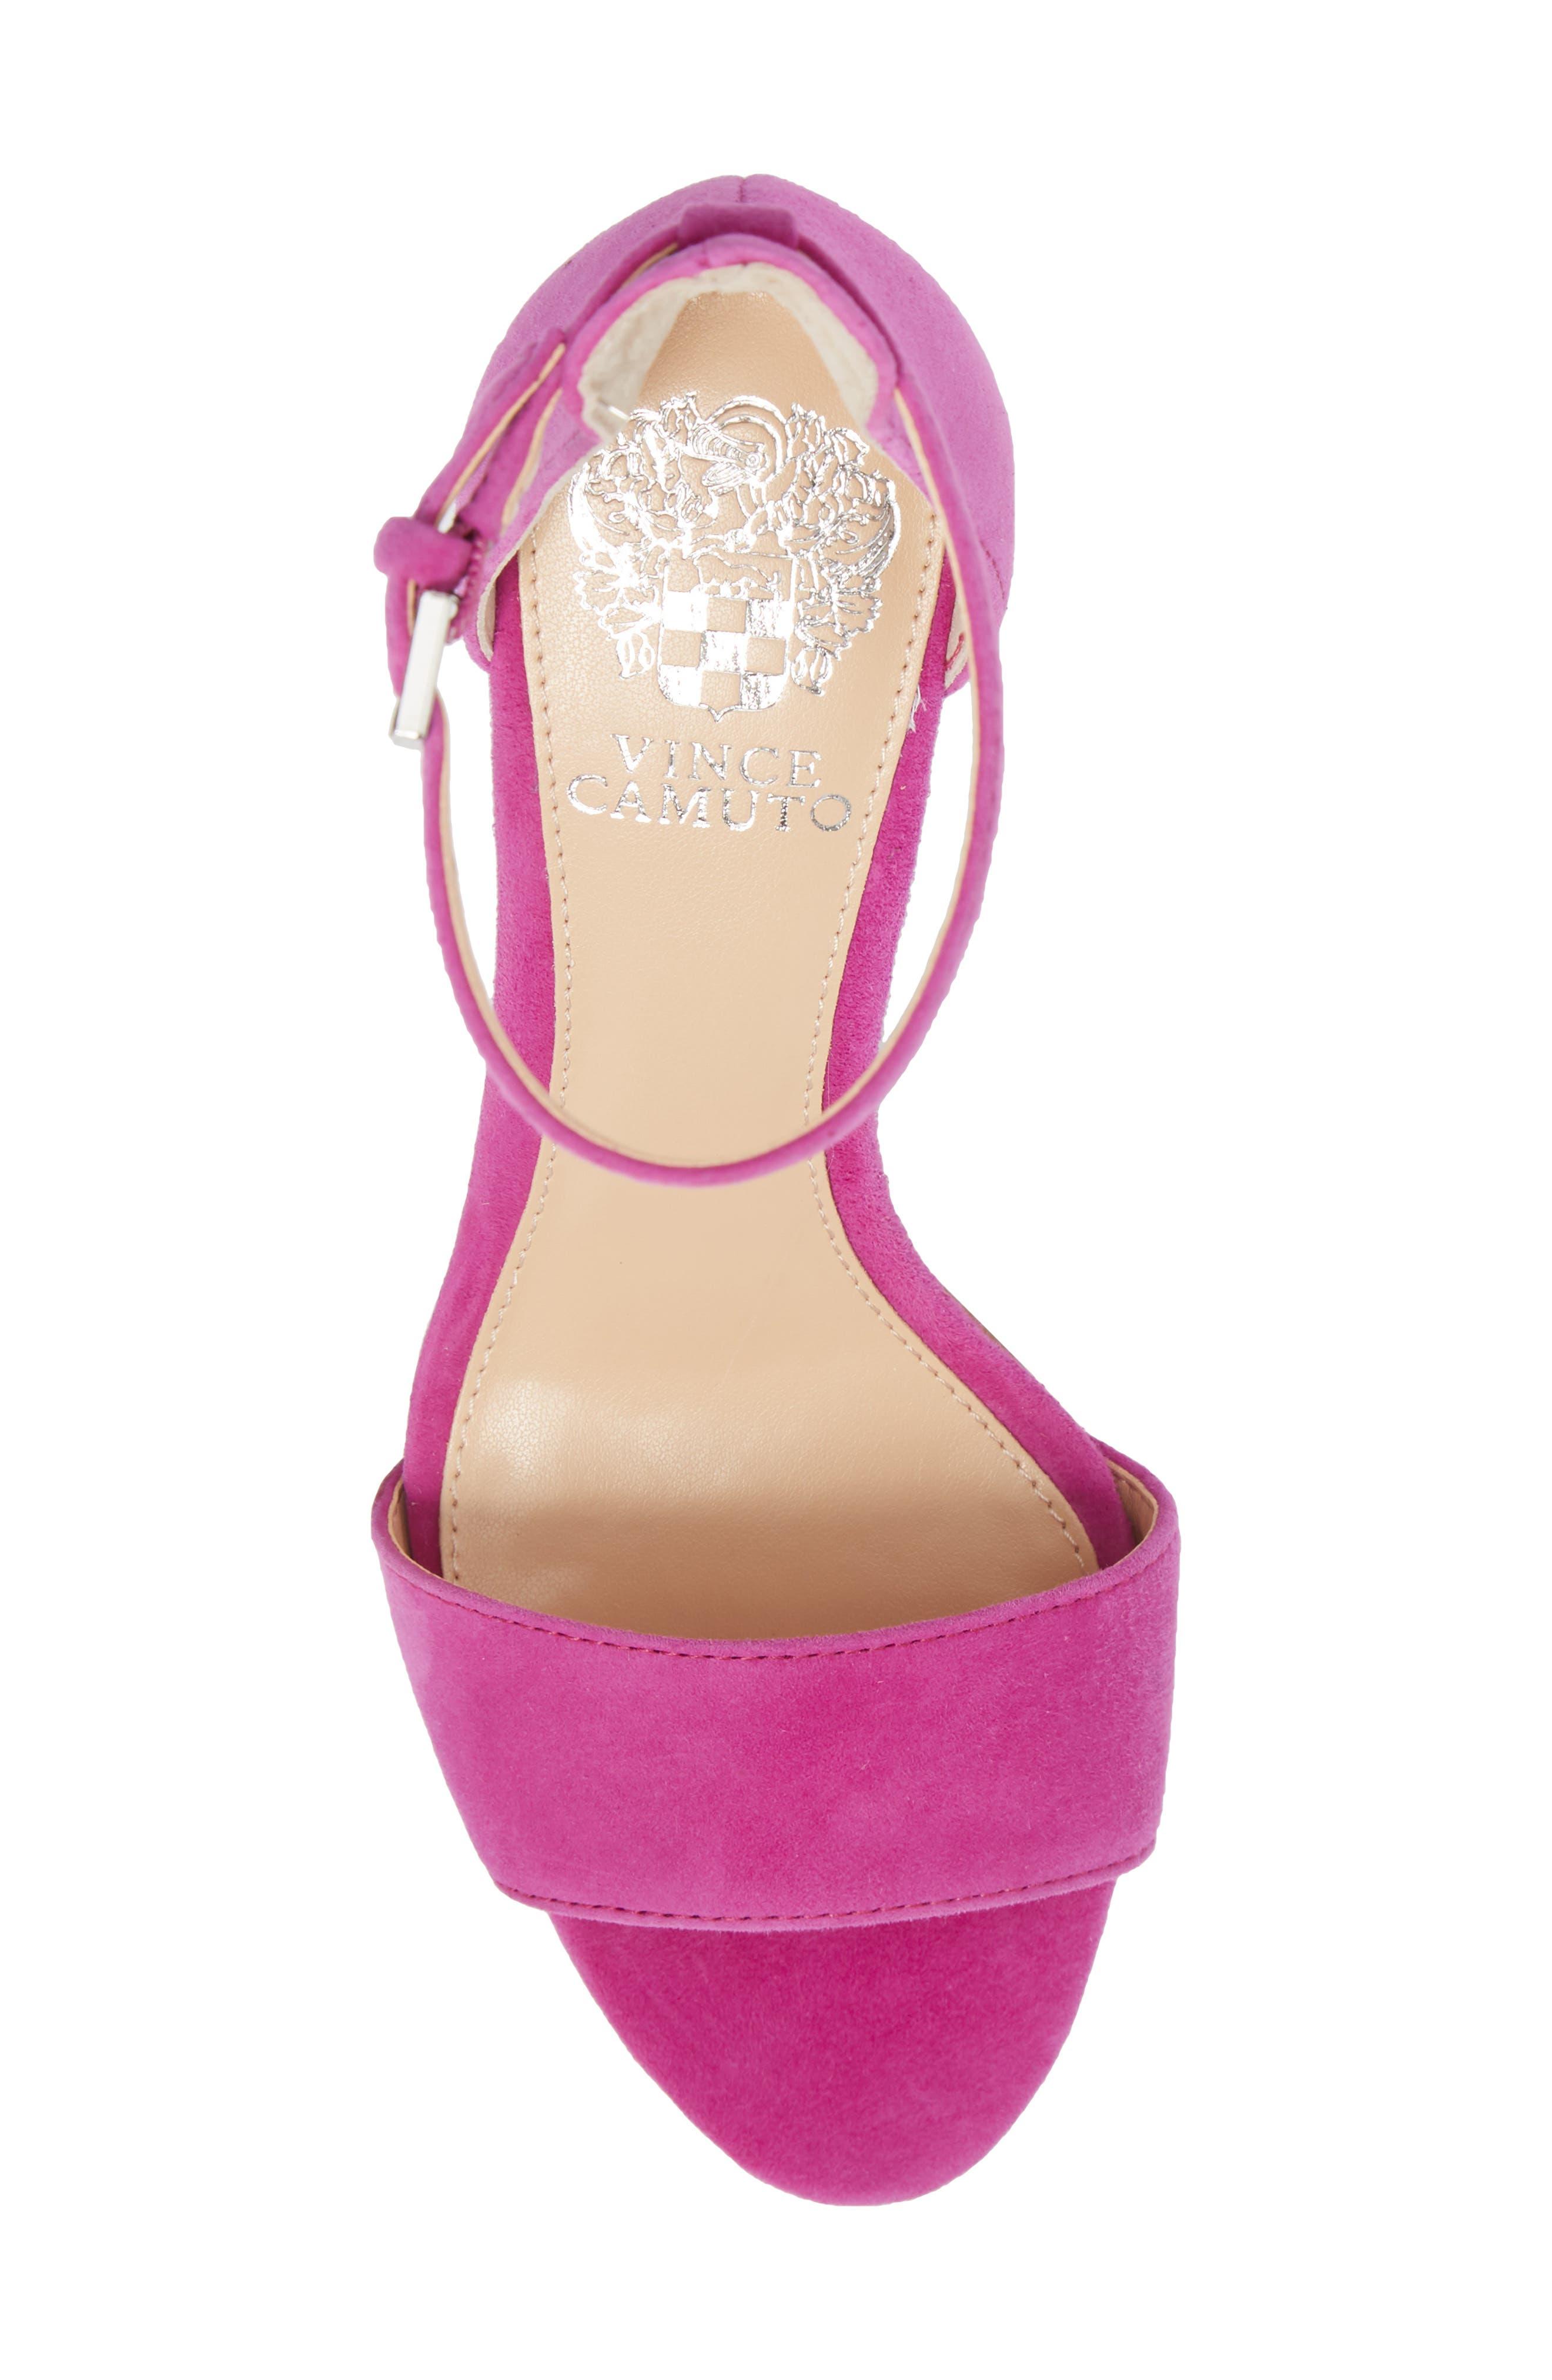 Corlina Ankle Strap Sandal,                             Alternate thumbnail 5, color,                             Drama Pink Suede